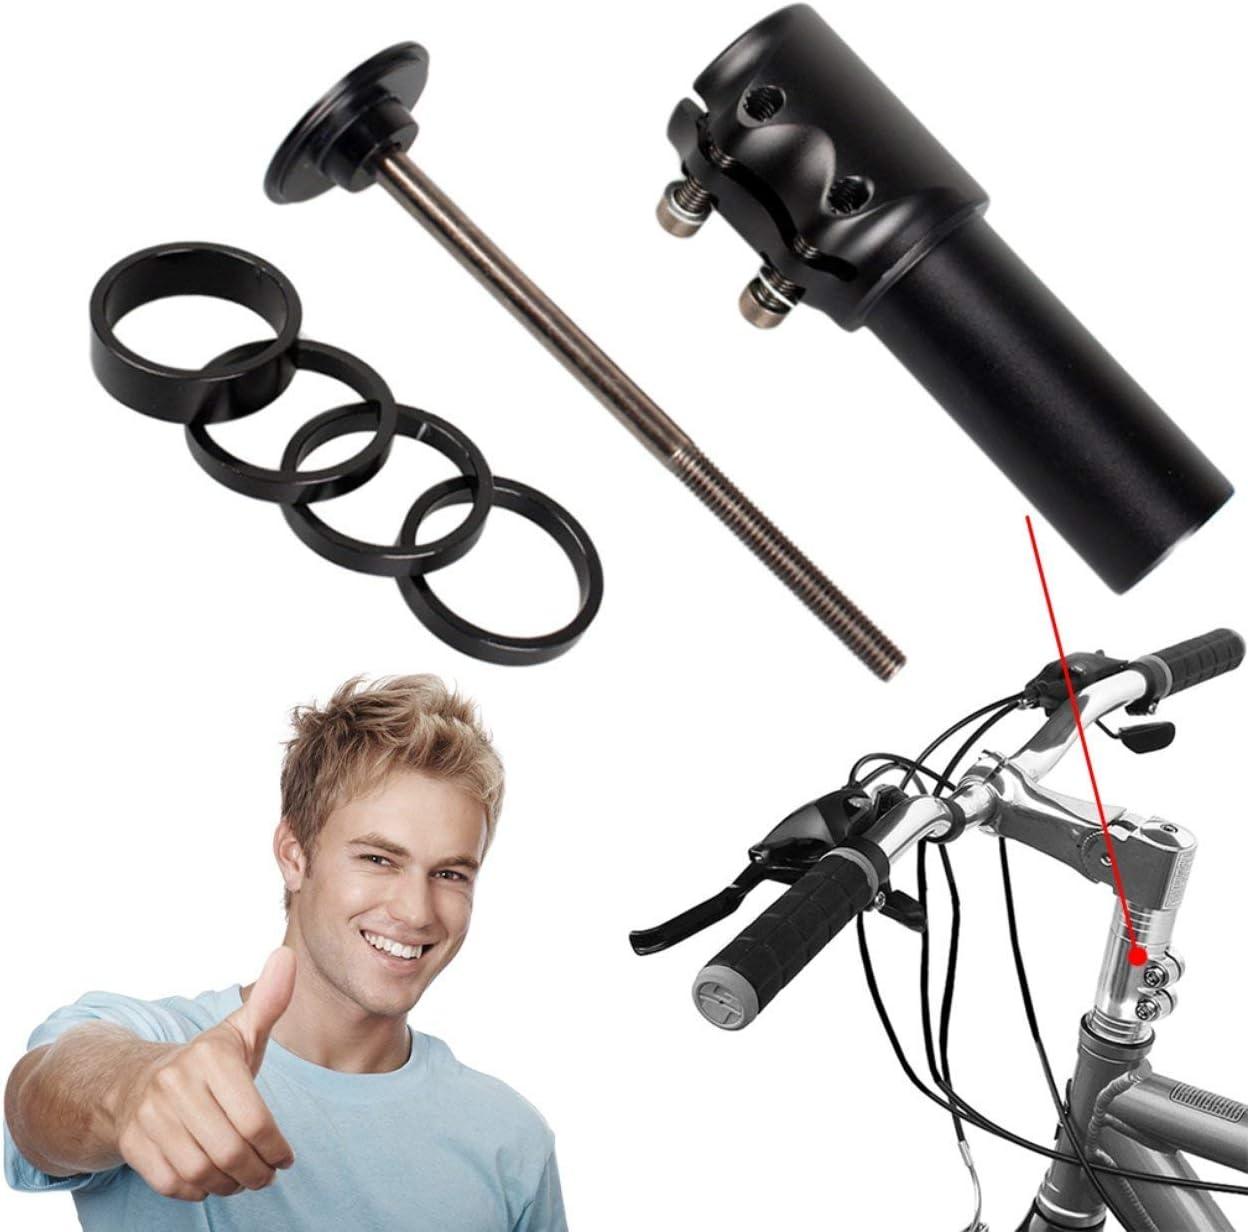 MTB Bicycle Bike Handlebar Fork Stem Rise Up Extender Extension Head Up Adaptor